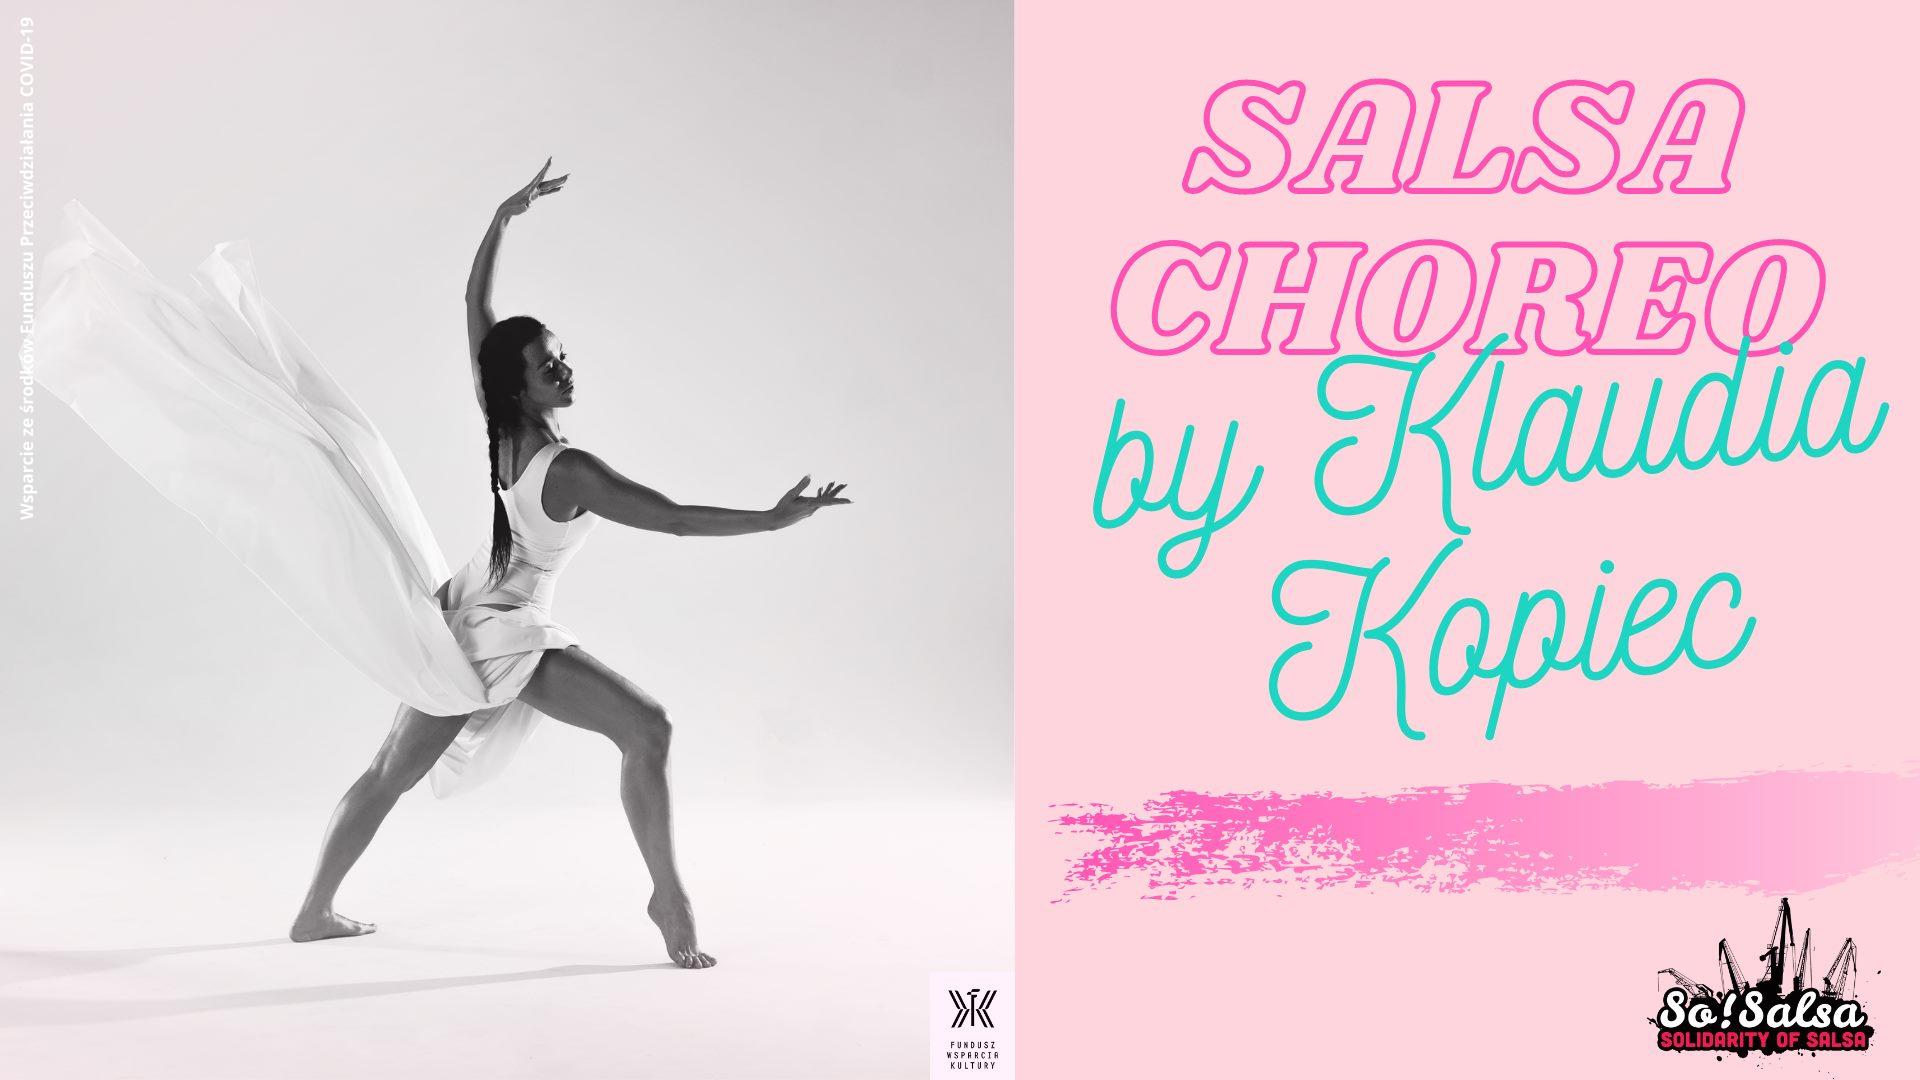 Salsa Choreo by Klaudia Kopiec - start 09/02/21